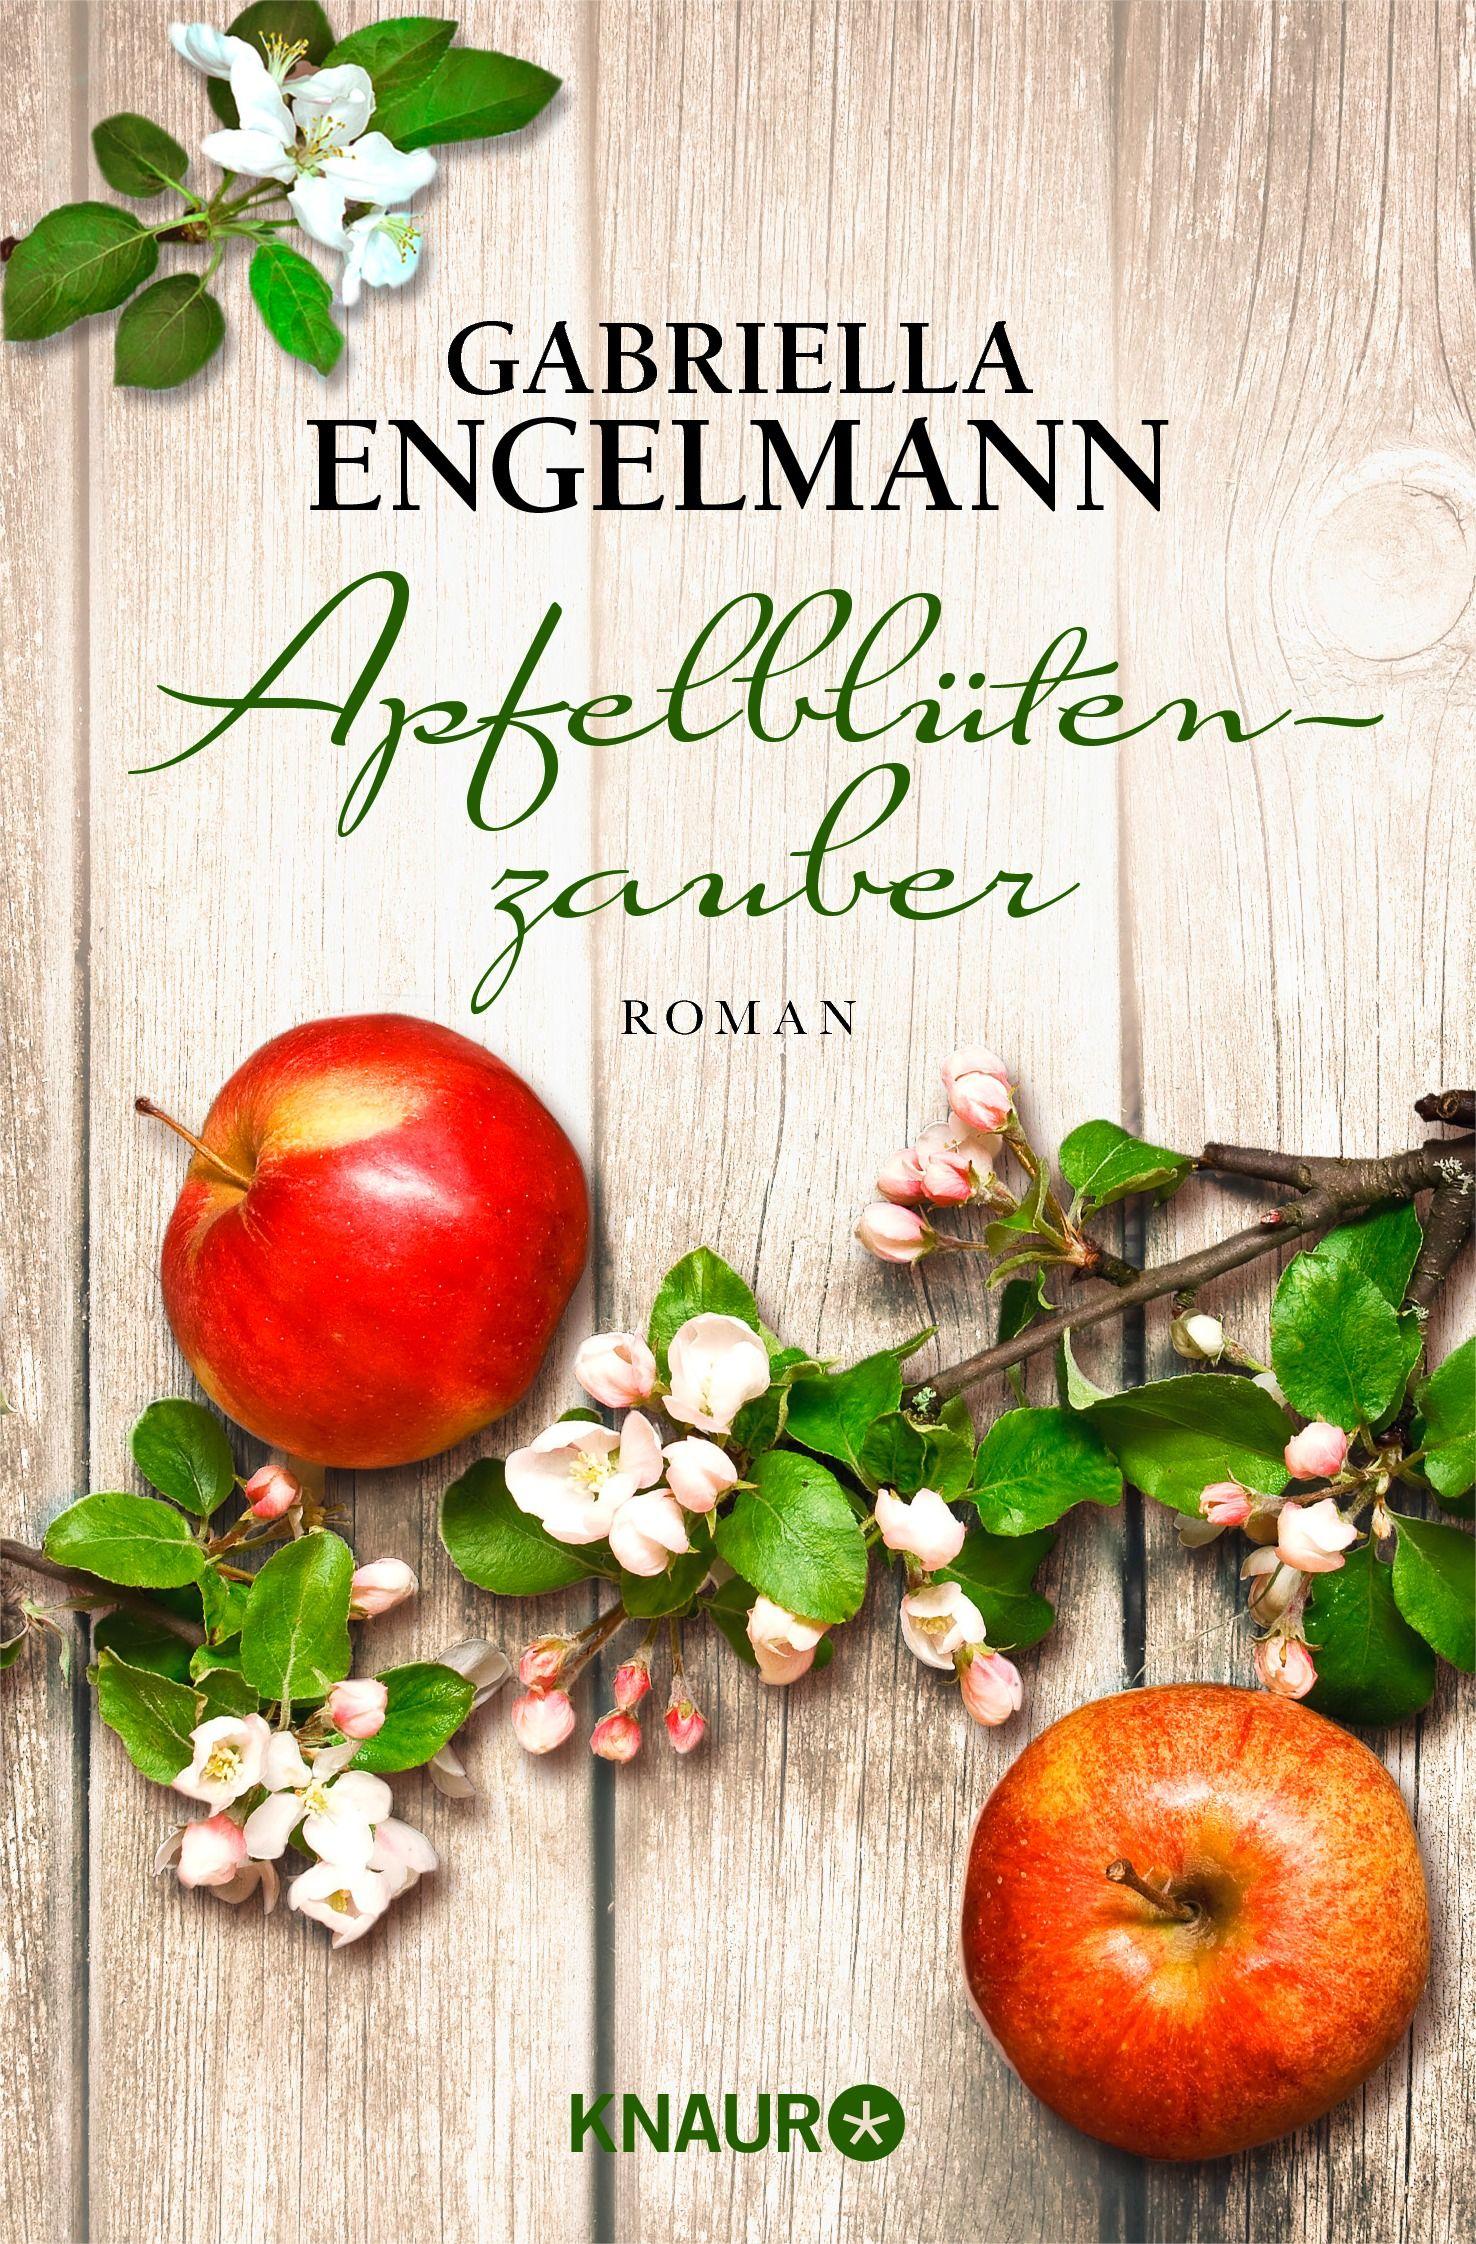 Gabriella Engelmann: Apfelblütenzauber (@droemerknaur ) #chiclit